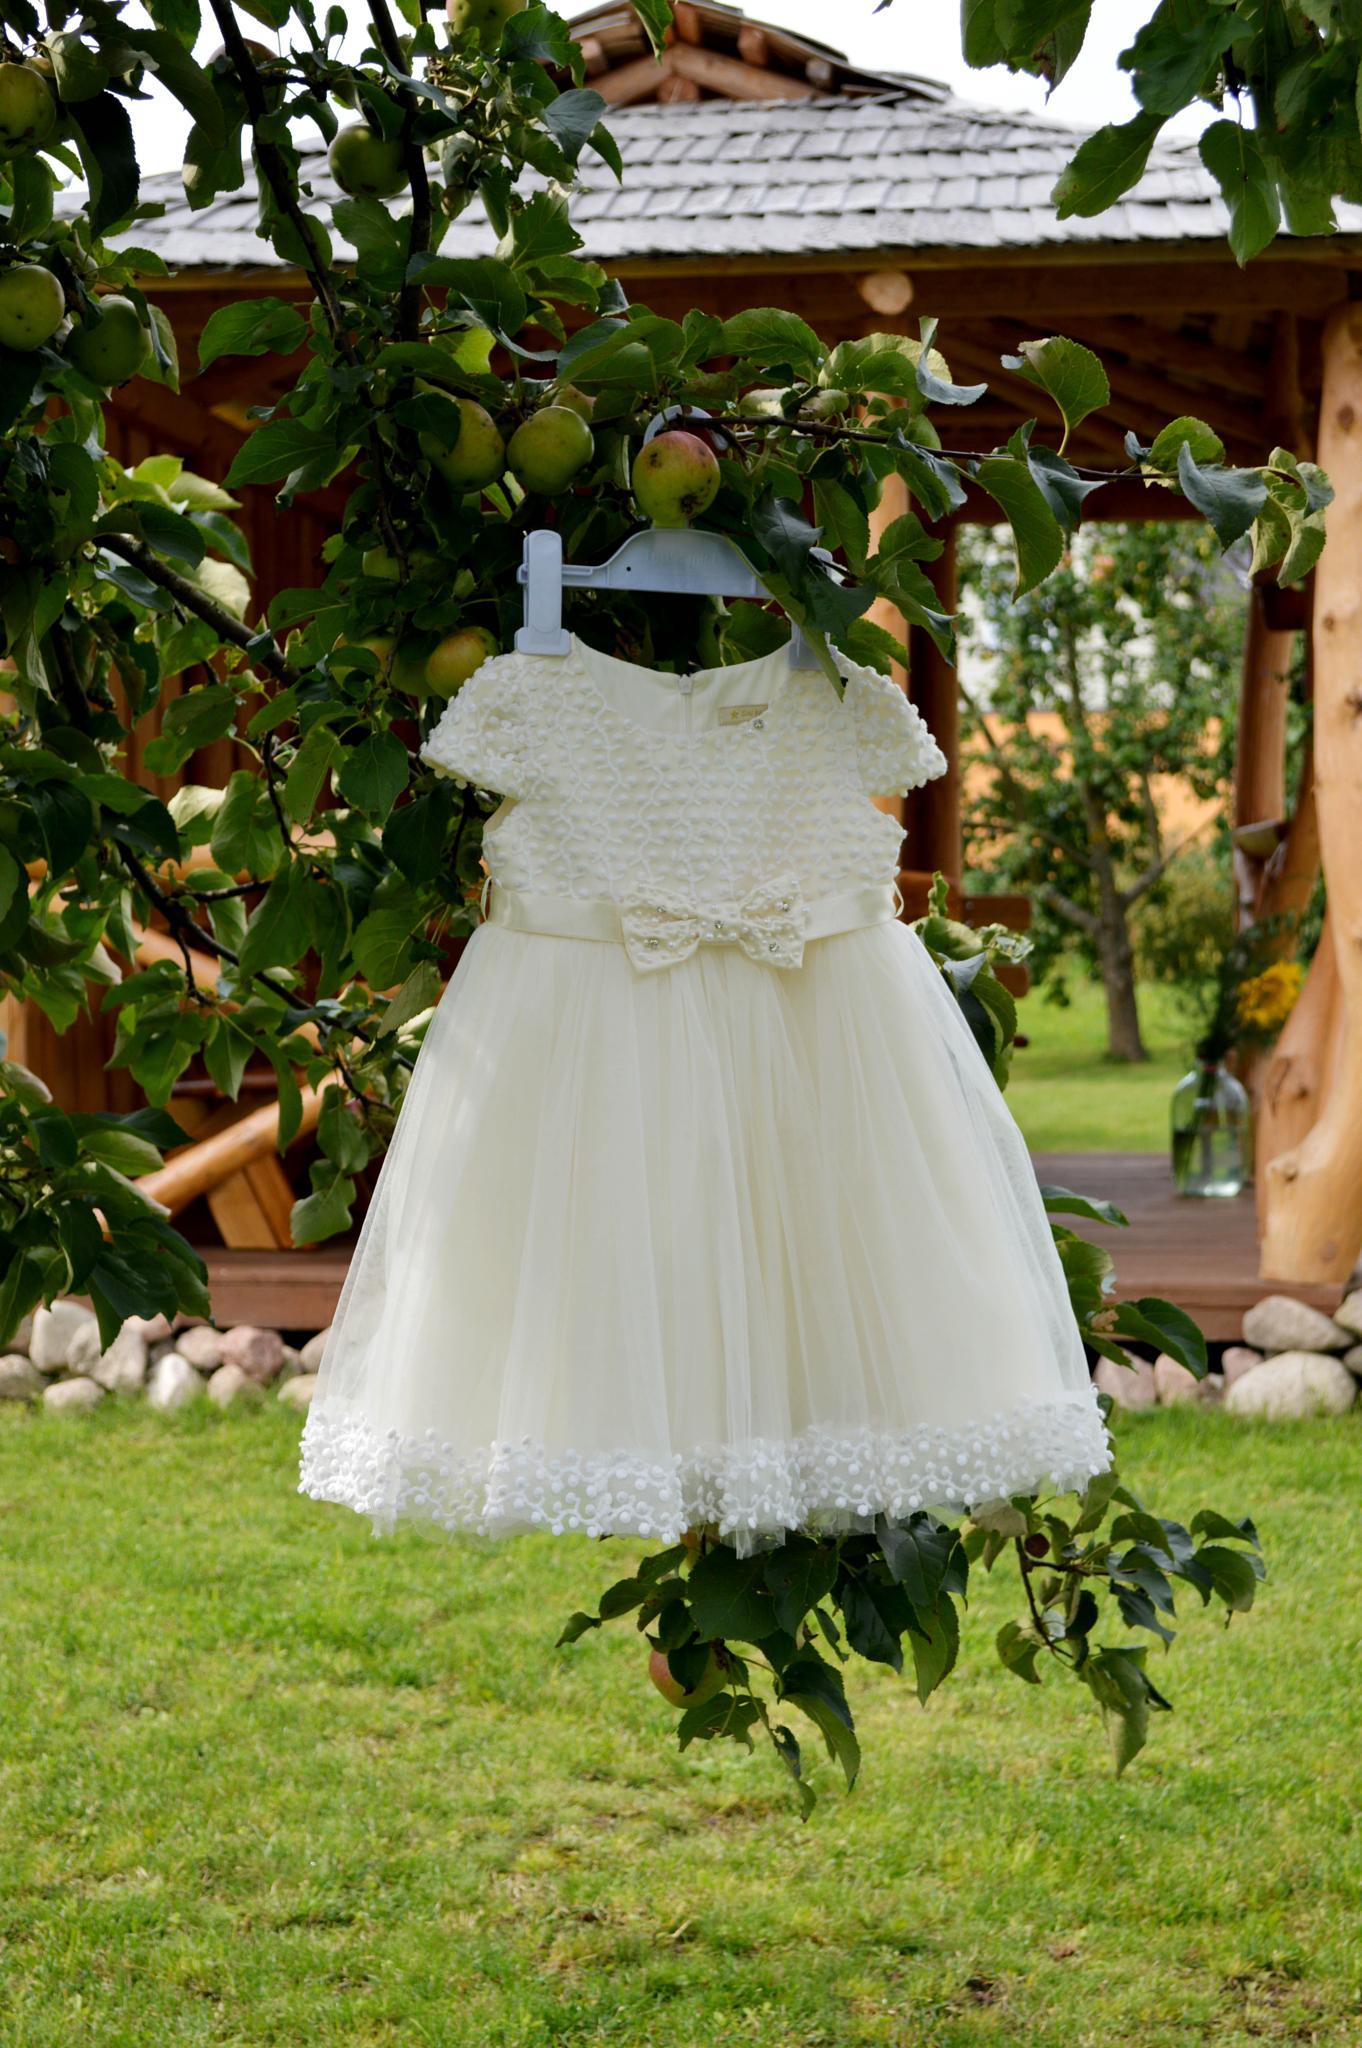 Christening dress 2 by Moni Mon ( M&M Fotografija )